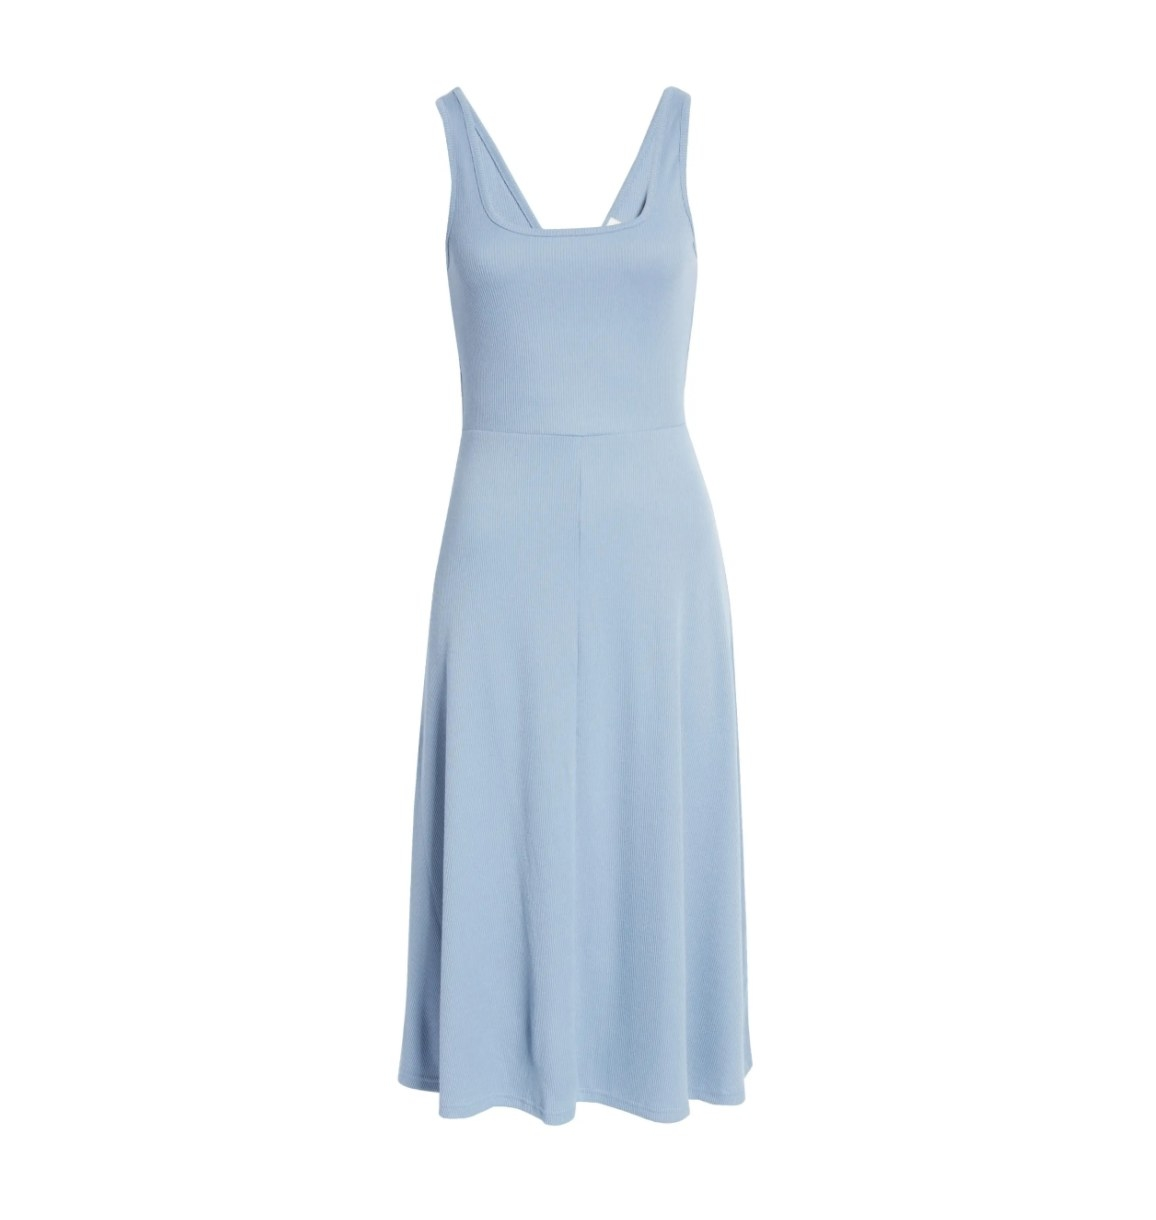 The A-line tank midi dress in blue stonewash